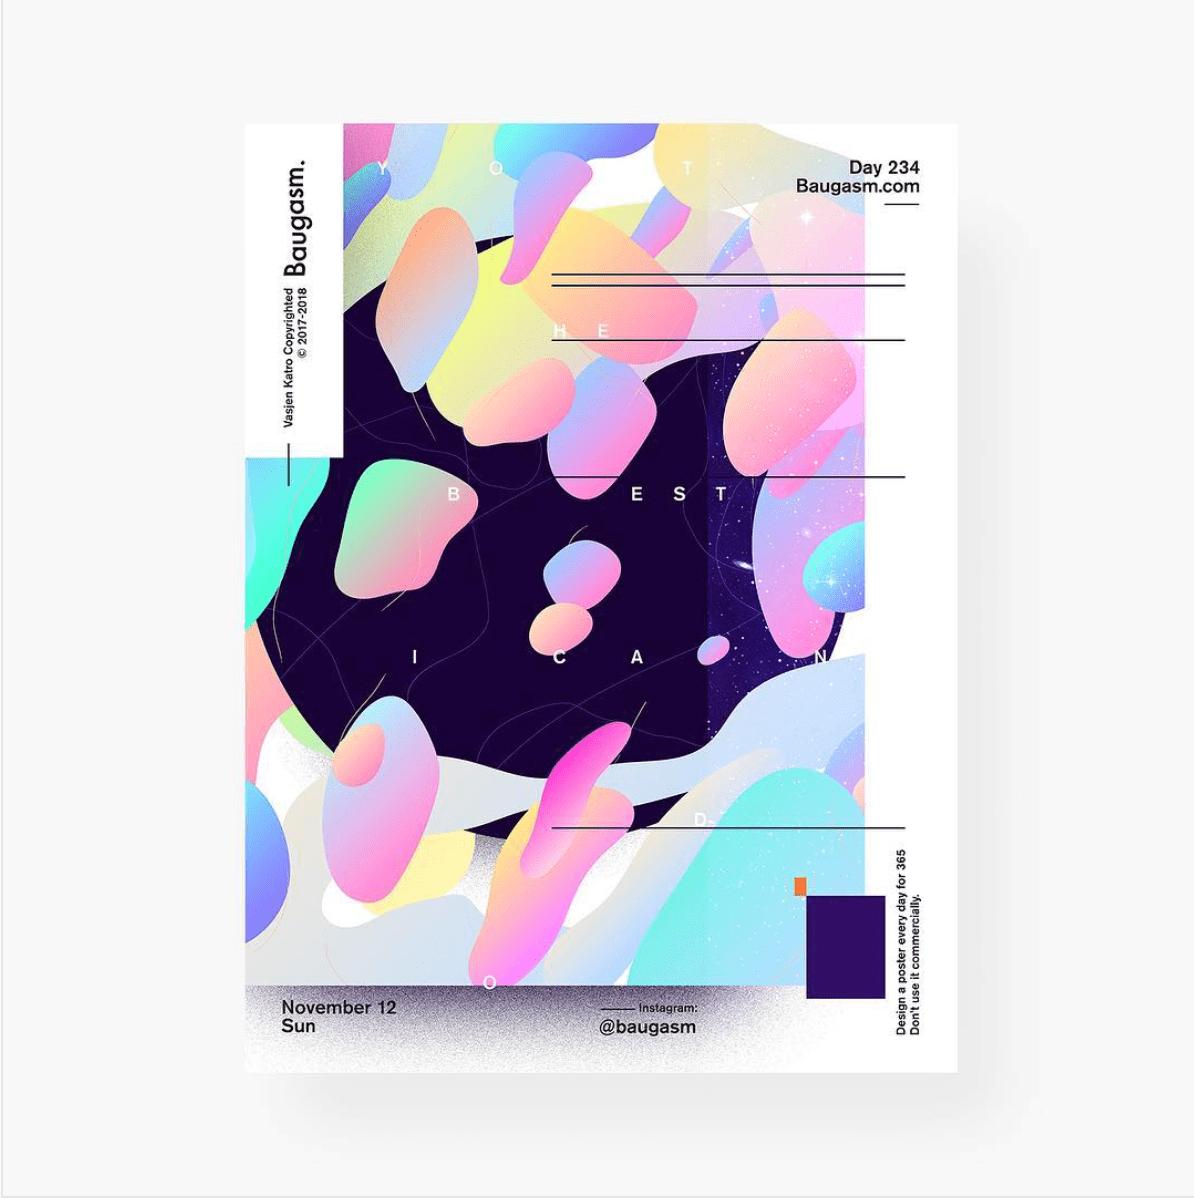 Проект: Daily PostersАвтор: Baugasm